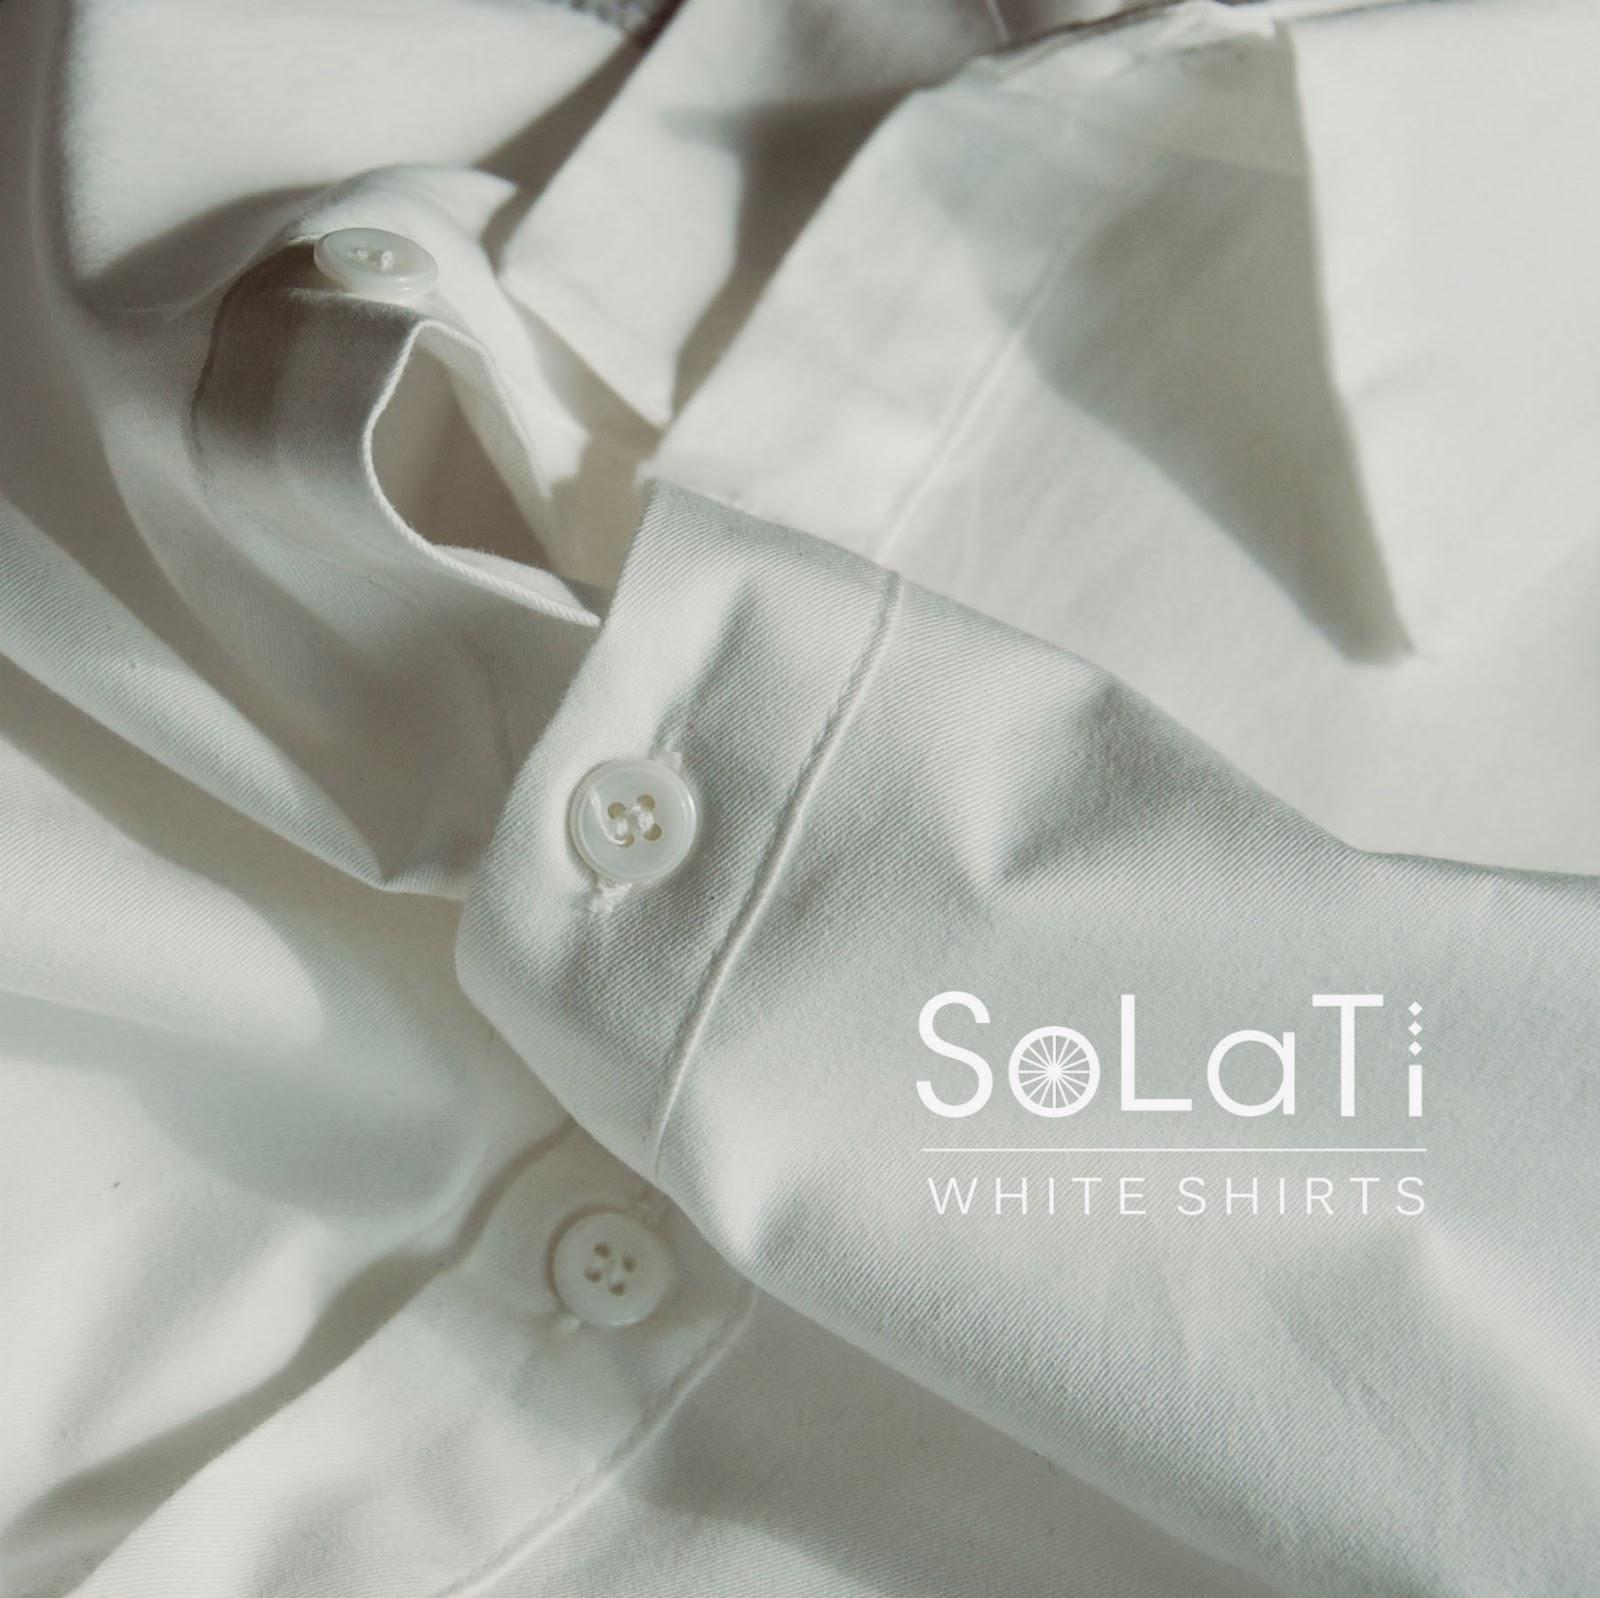 [Single] SoLaTi – White Shirts